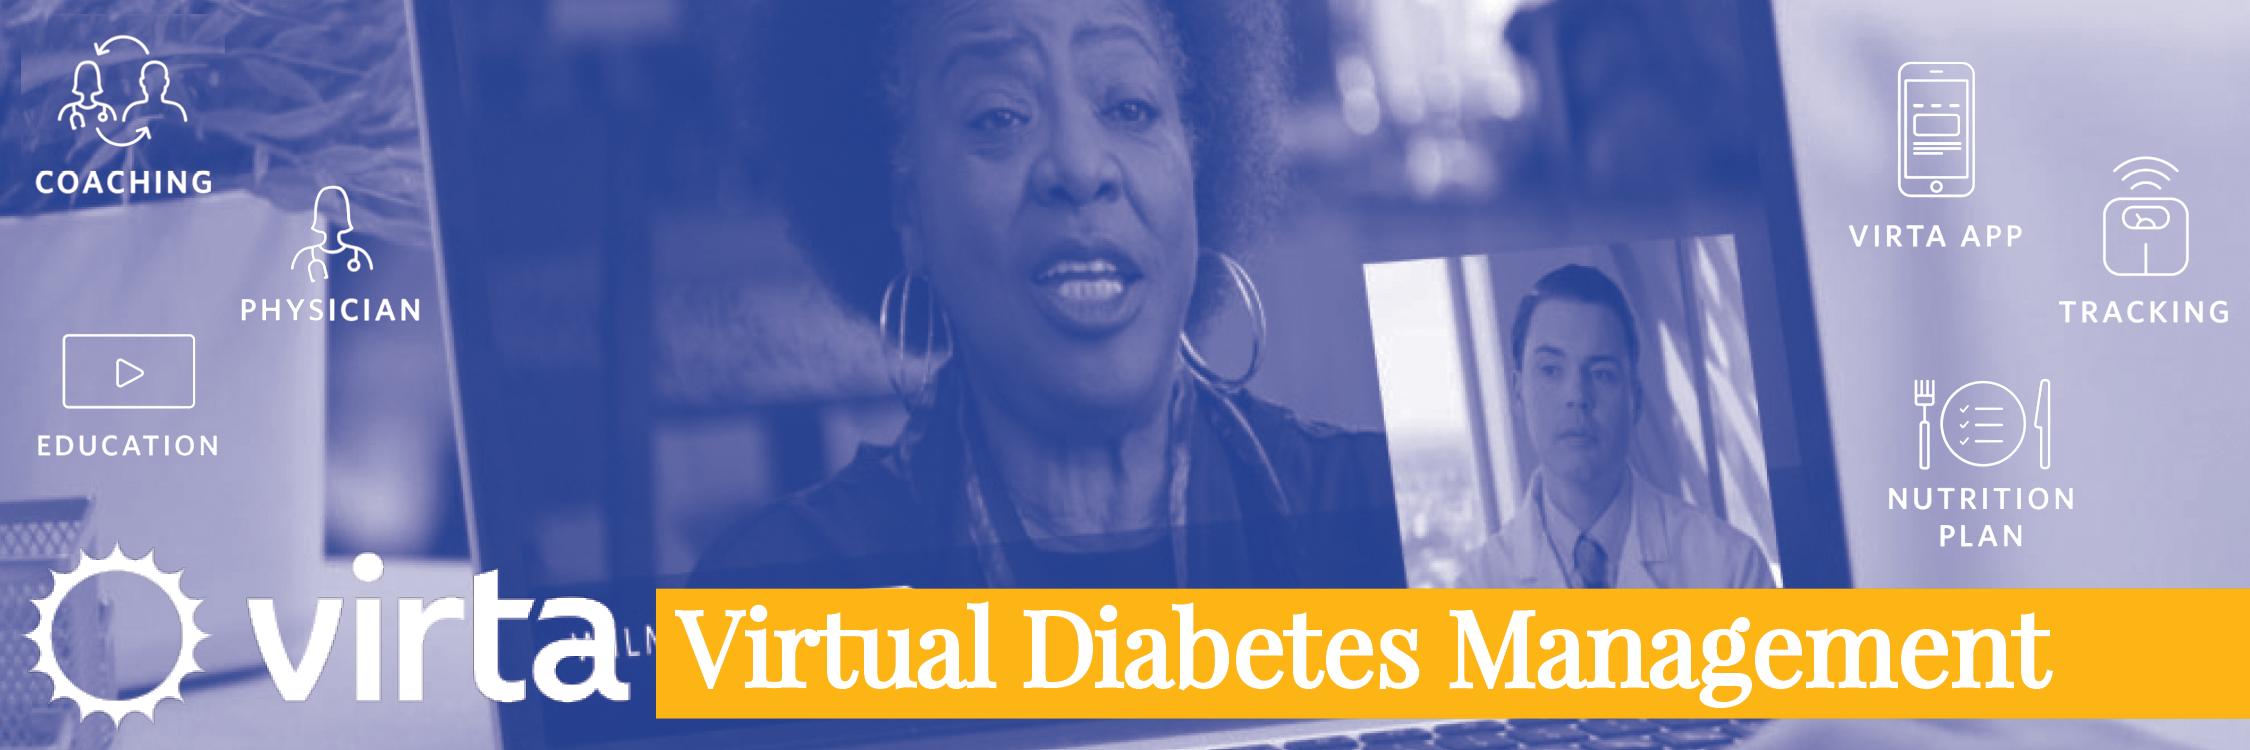 Image 2: Virta - Virtual Diabetes Management